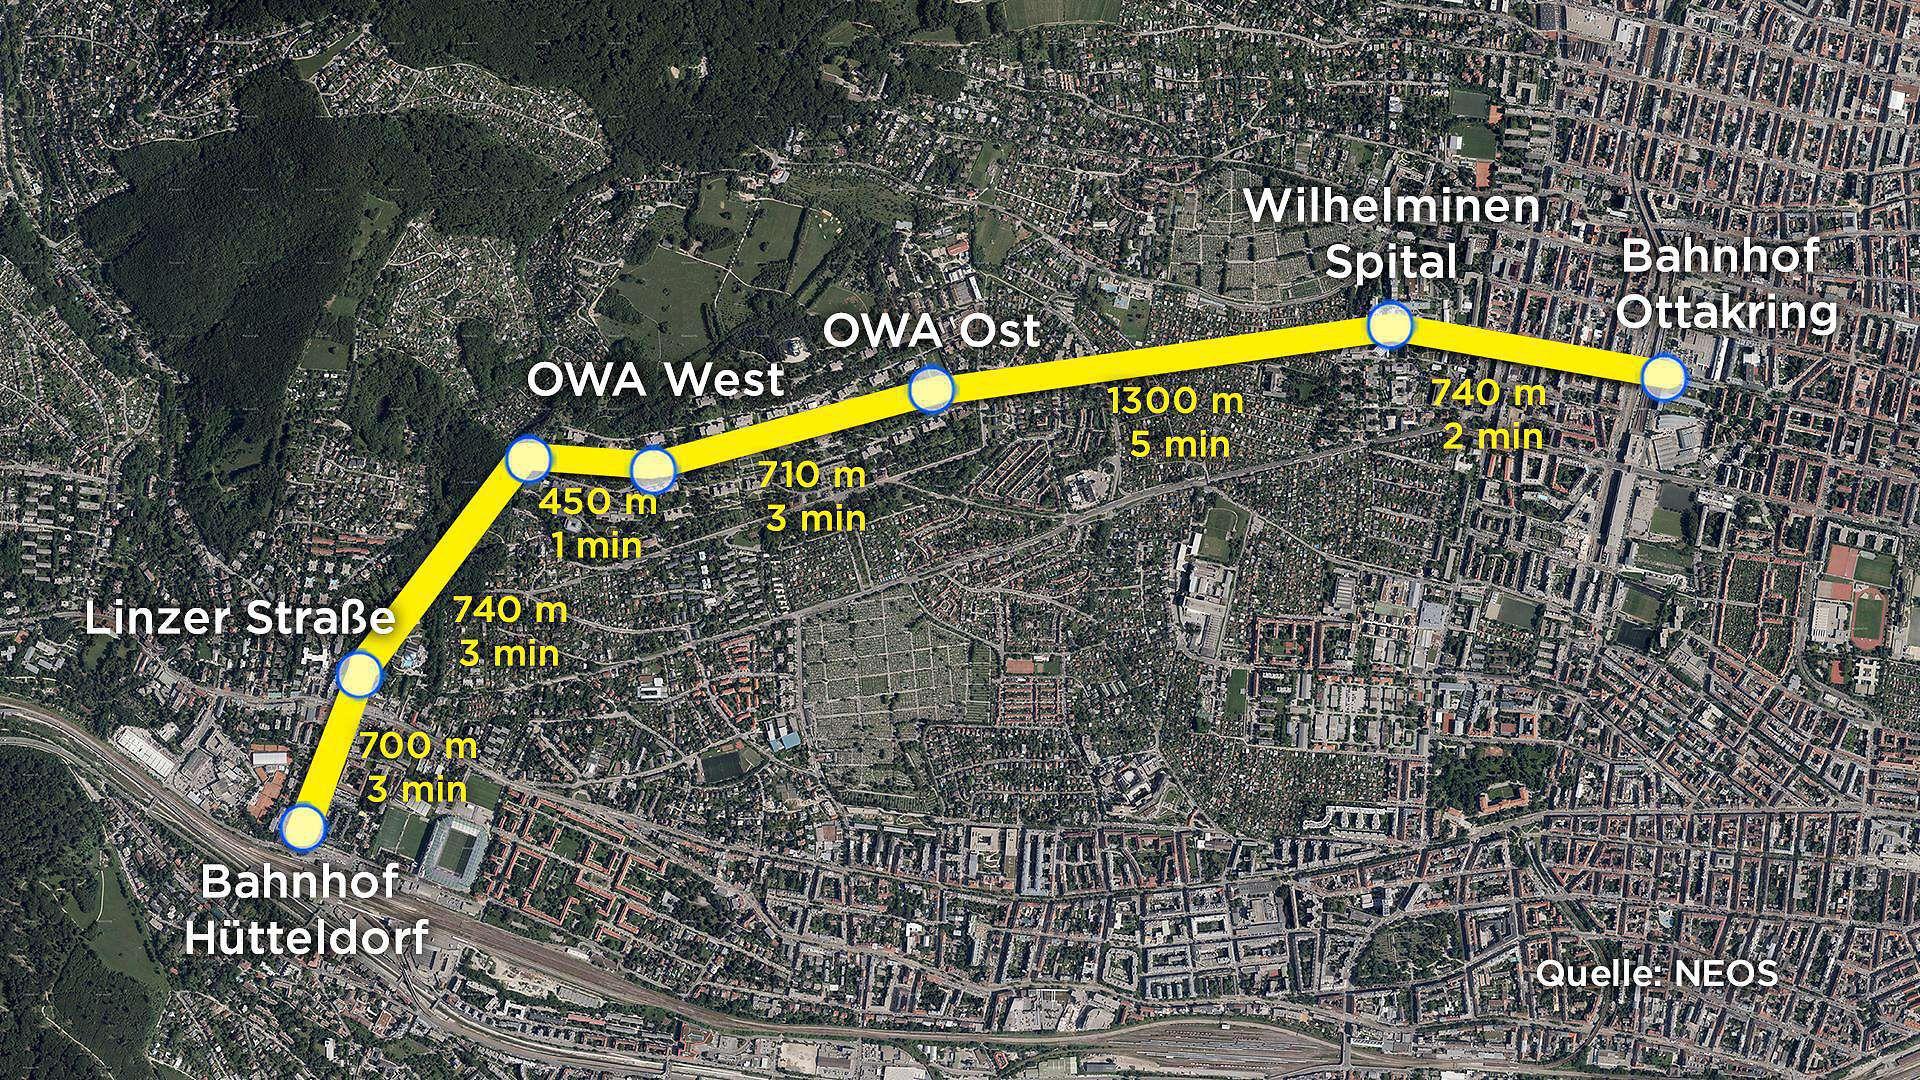 Die geplante Route der Wiener Stadtseilbahn